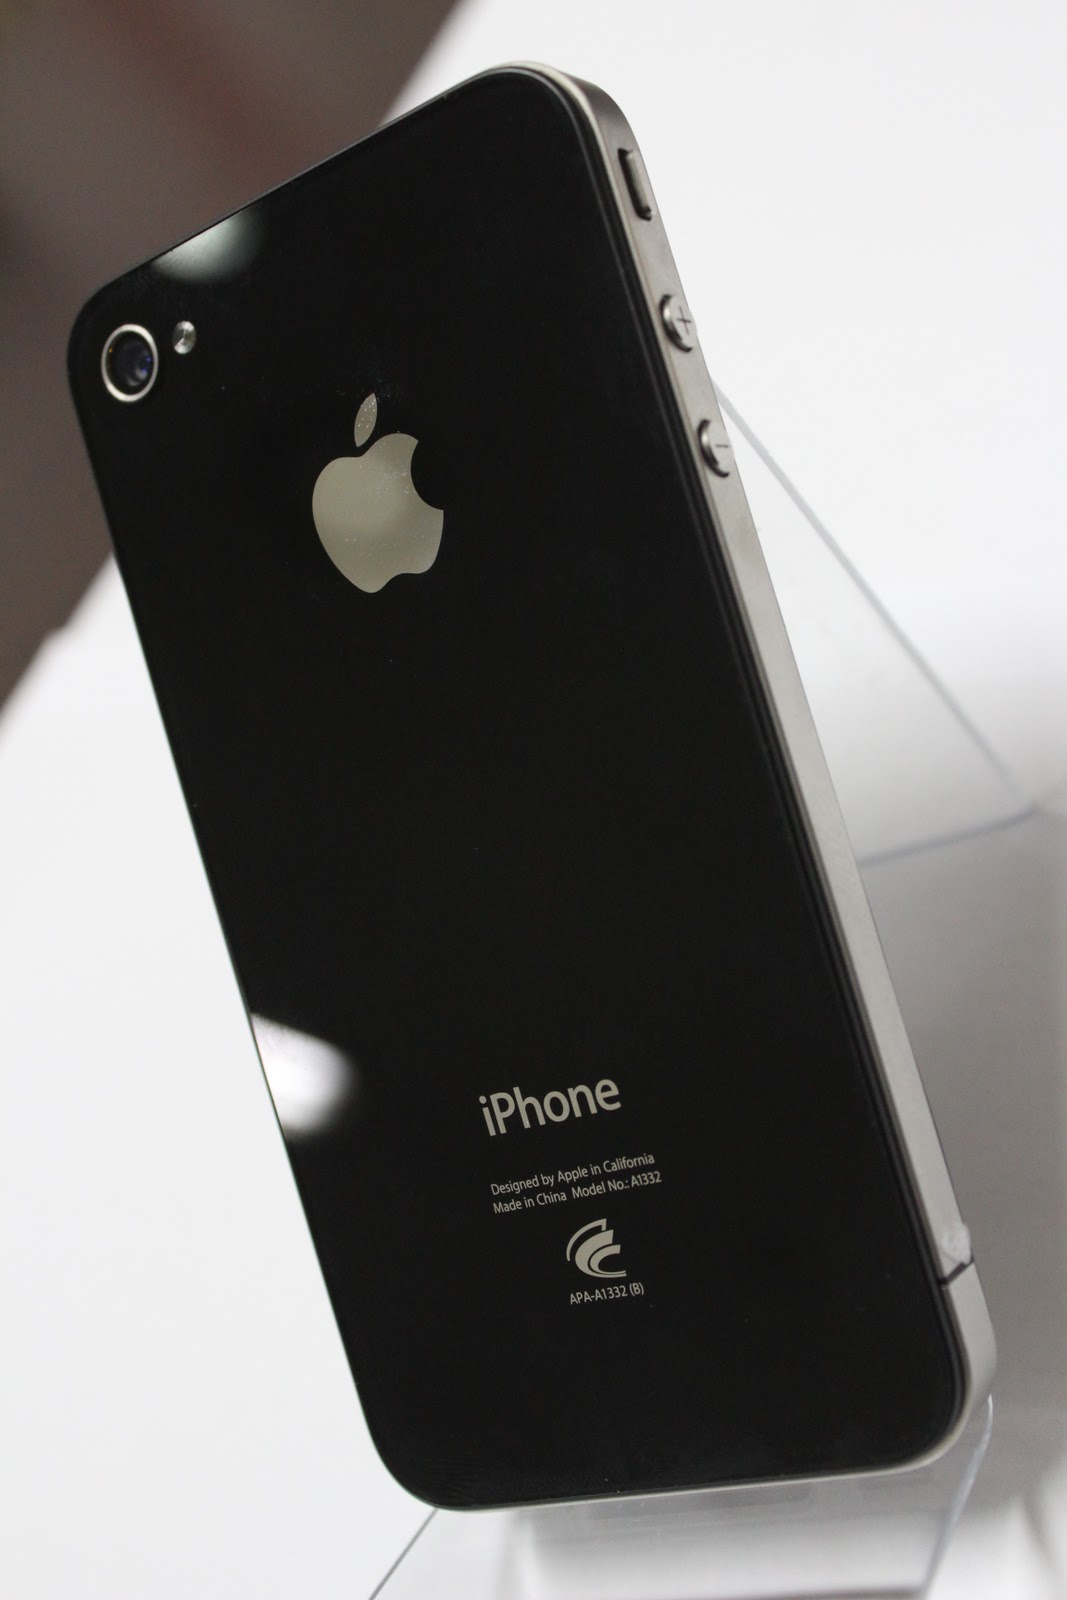 iphone 4 second hand price